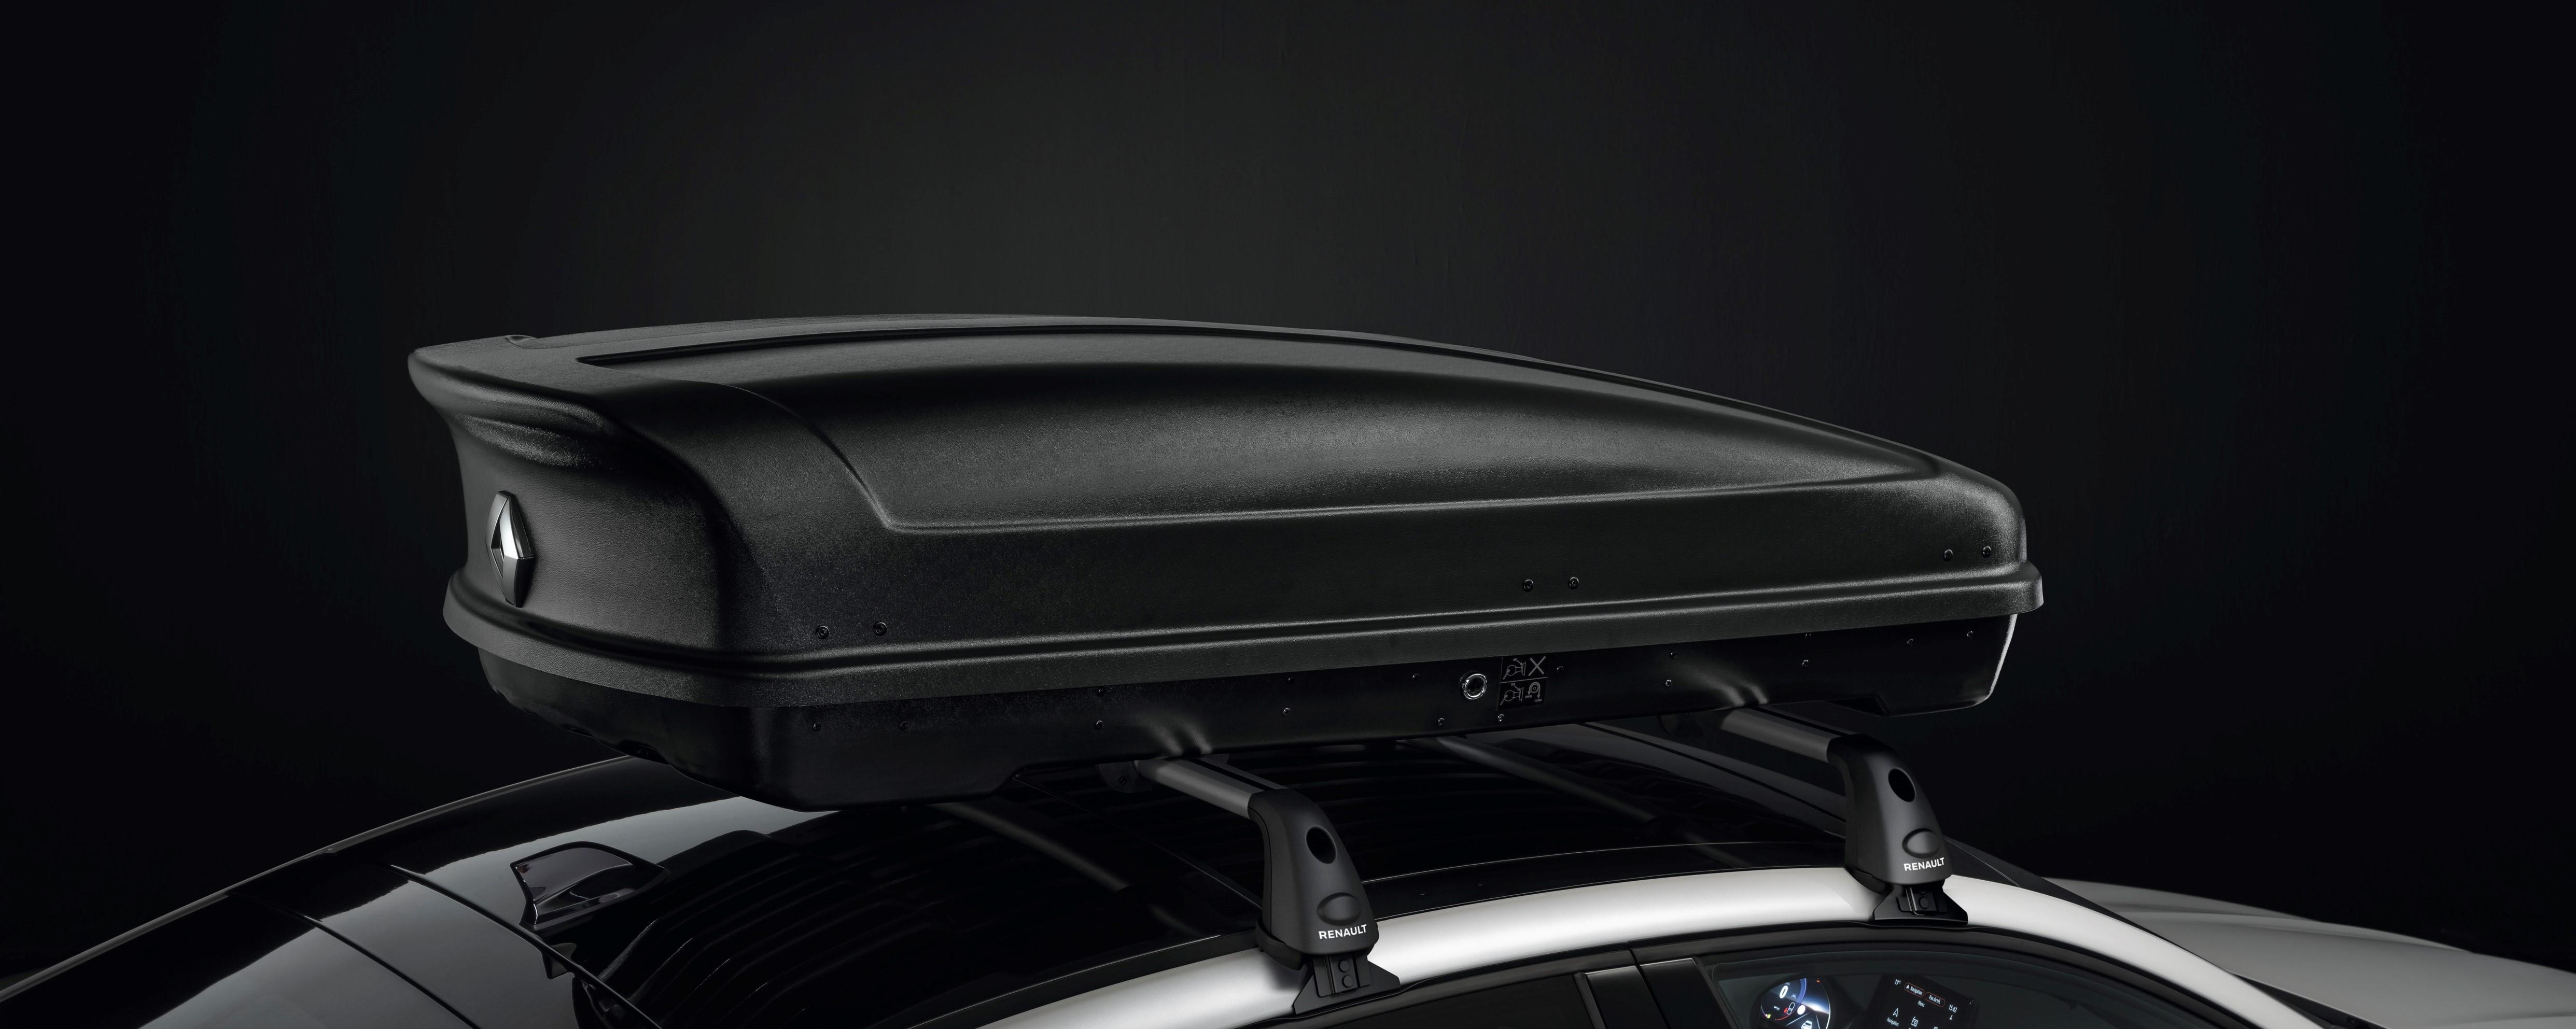 Strešni prostor Renault – 380l – matirana črna